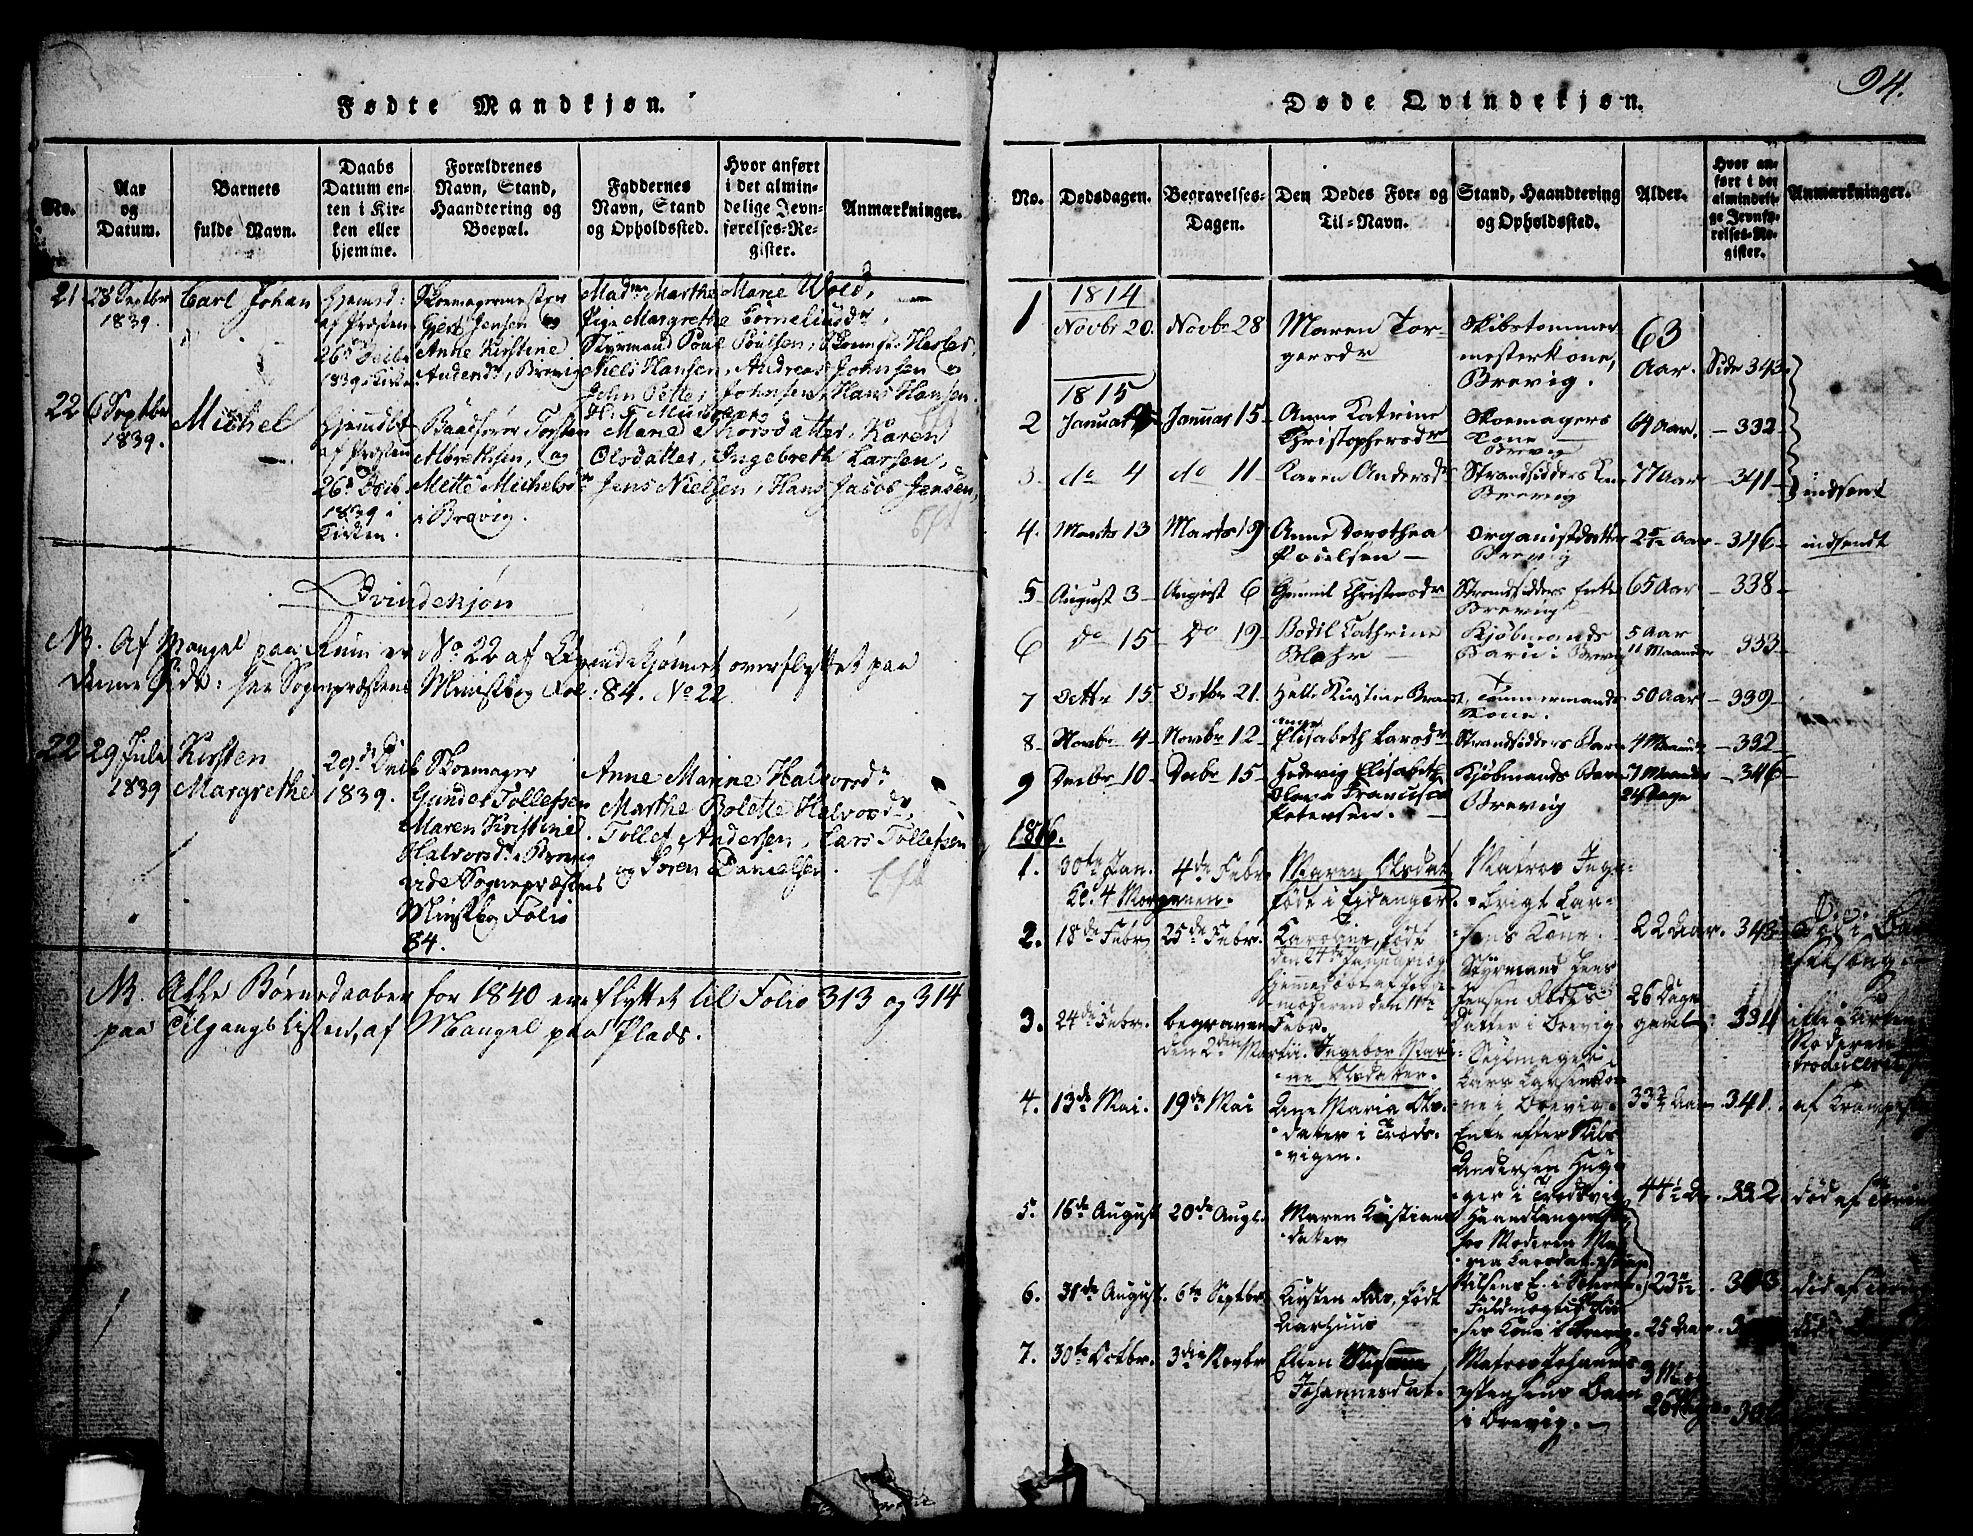 SAKO, Brevik kirkebøker, G/Ga/L0001: Klokkerbok nr. 1, 1814-1845, s. 94